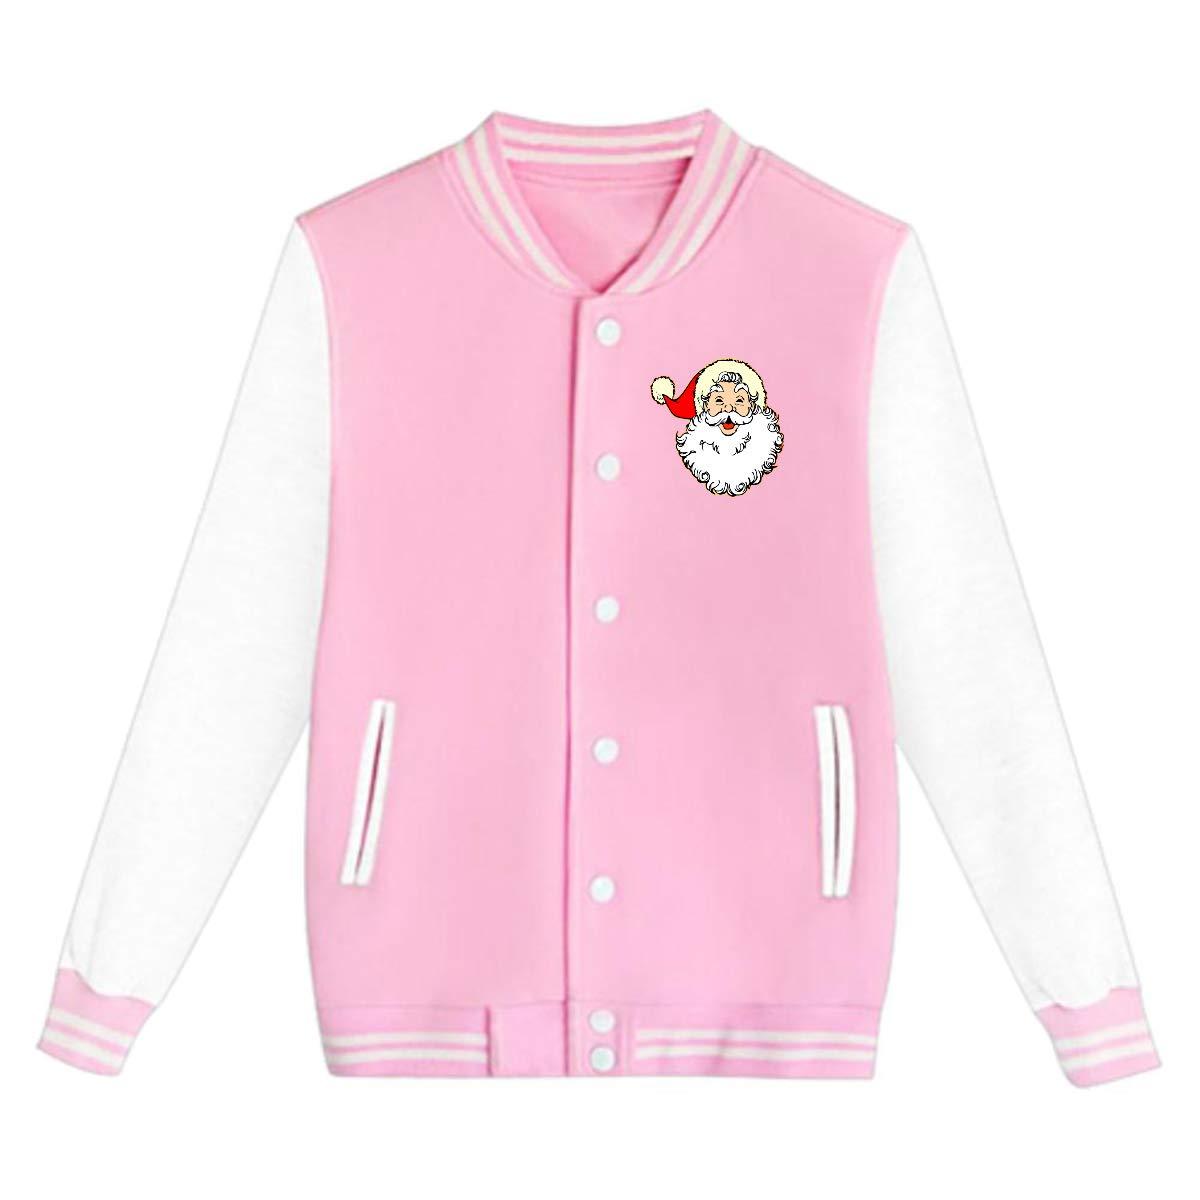 Tina TN Santa Claus Teens Boys Girl Varsity Baseball Jacket Long Sleeve Sport Baseball Uniform Jacket Coat Sweater Black